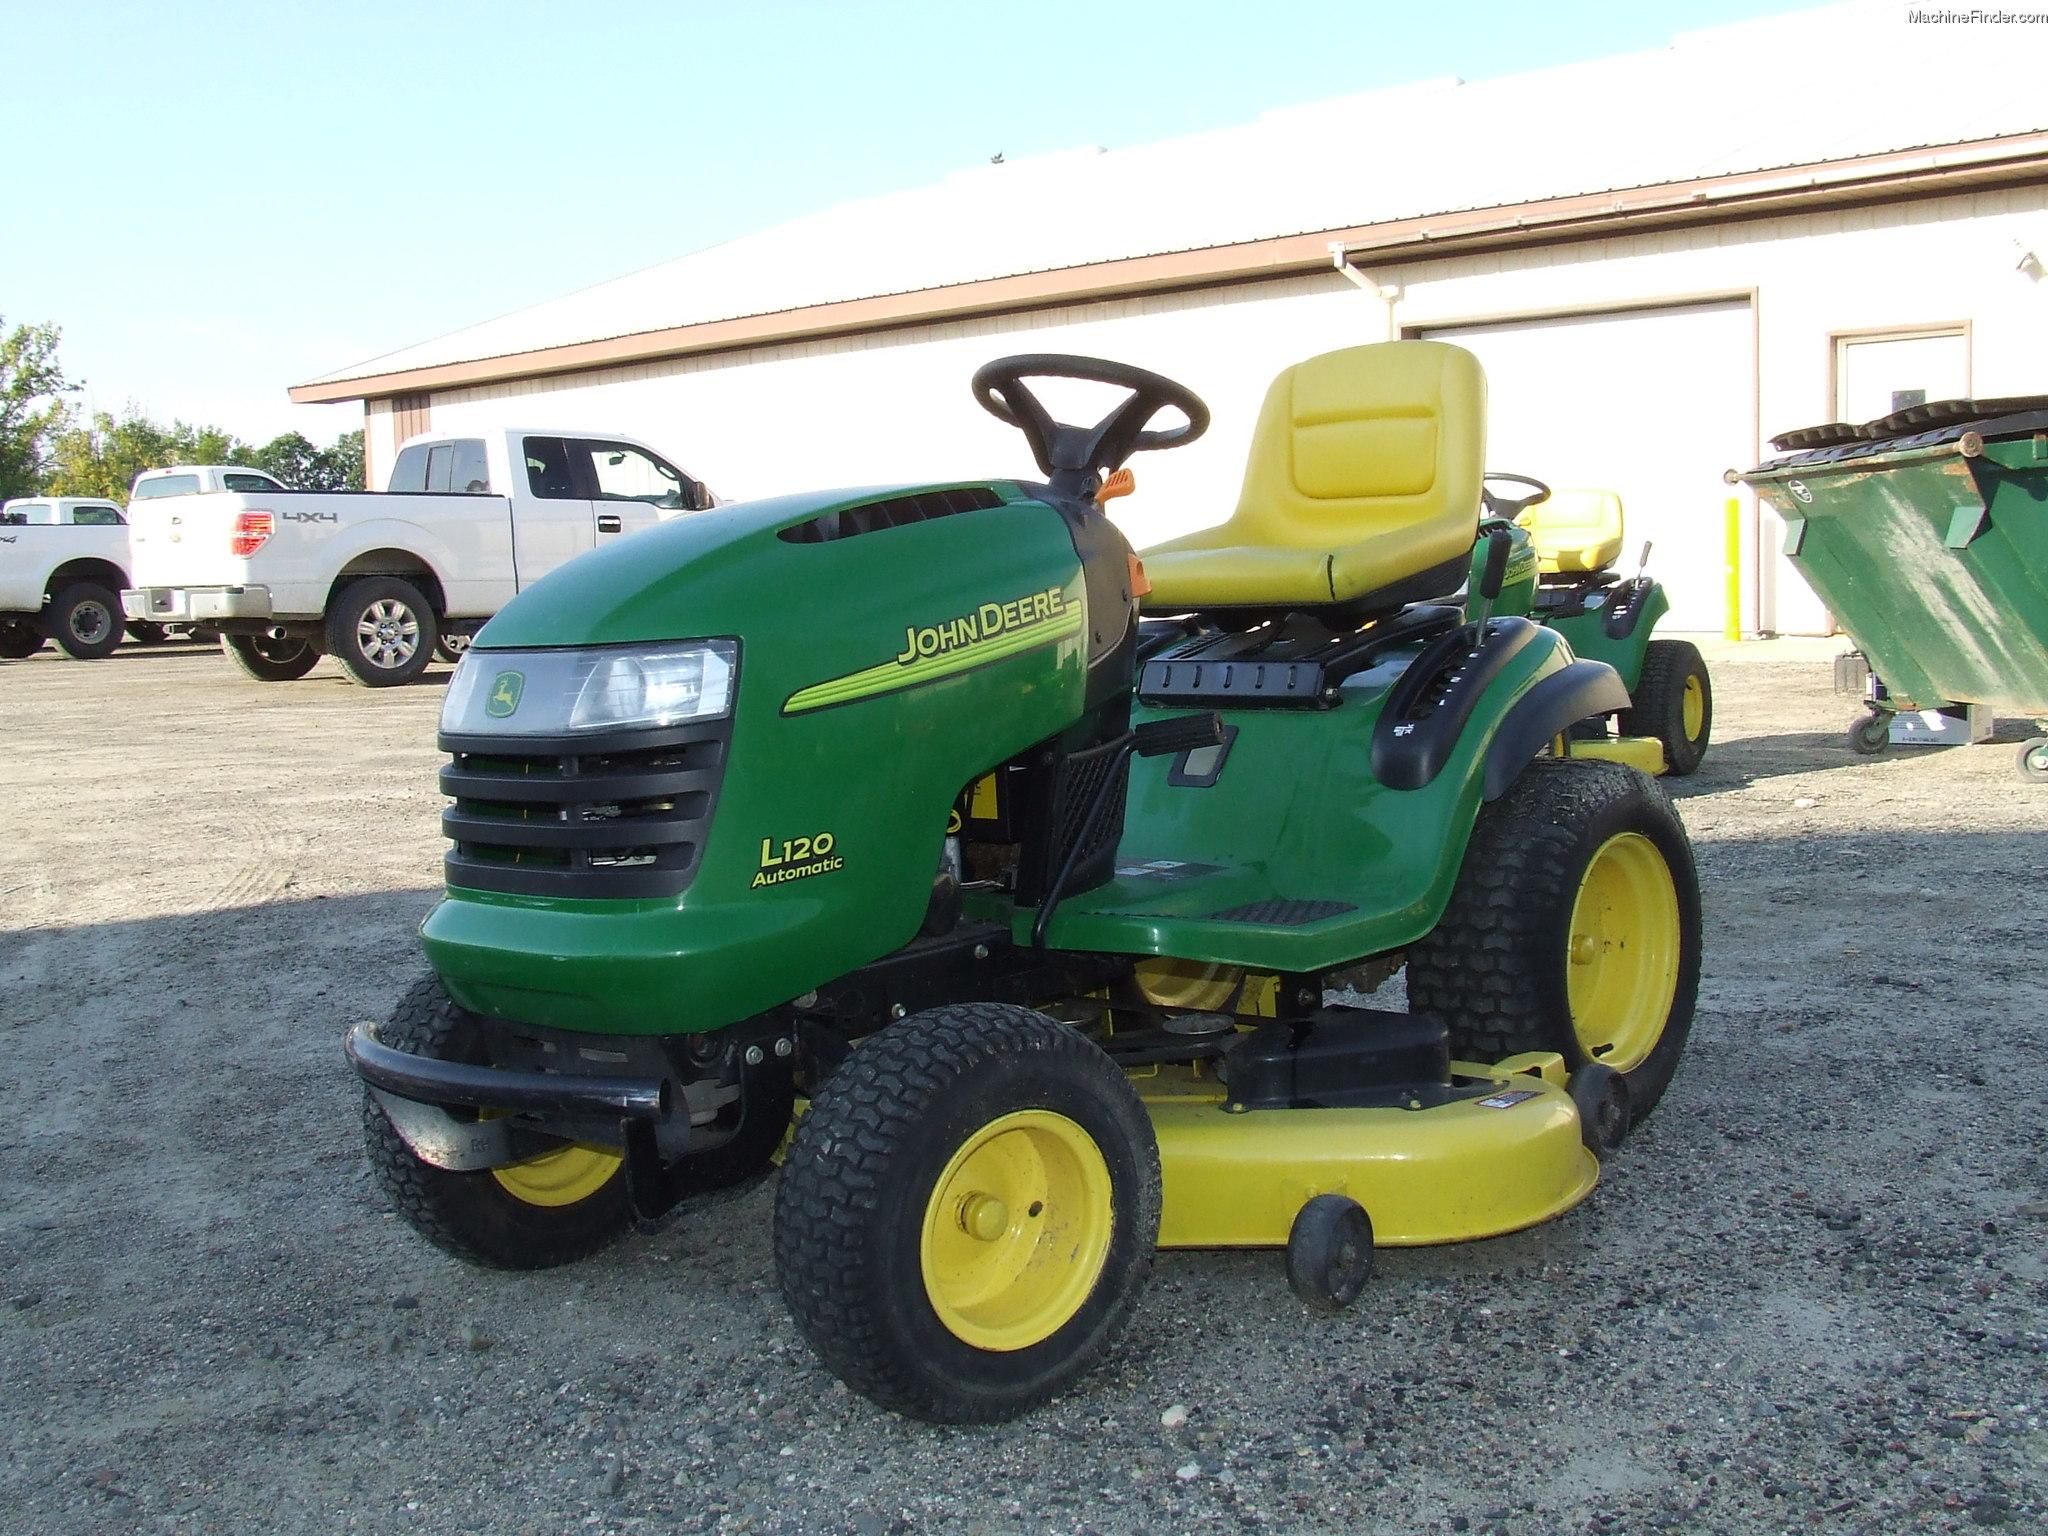 2004 John Deere L120 Lawn & Garden and Commercial Mowing - John Deere ...